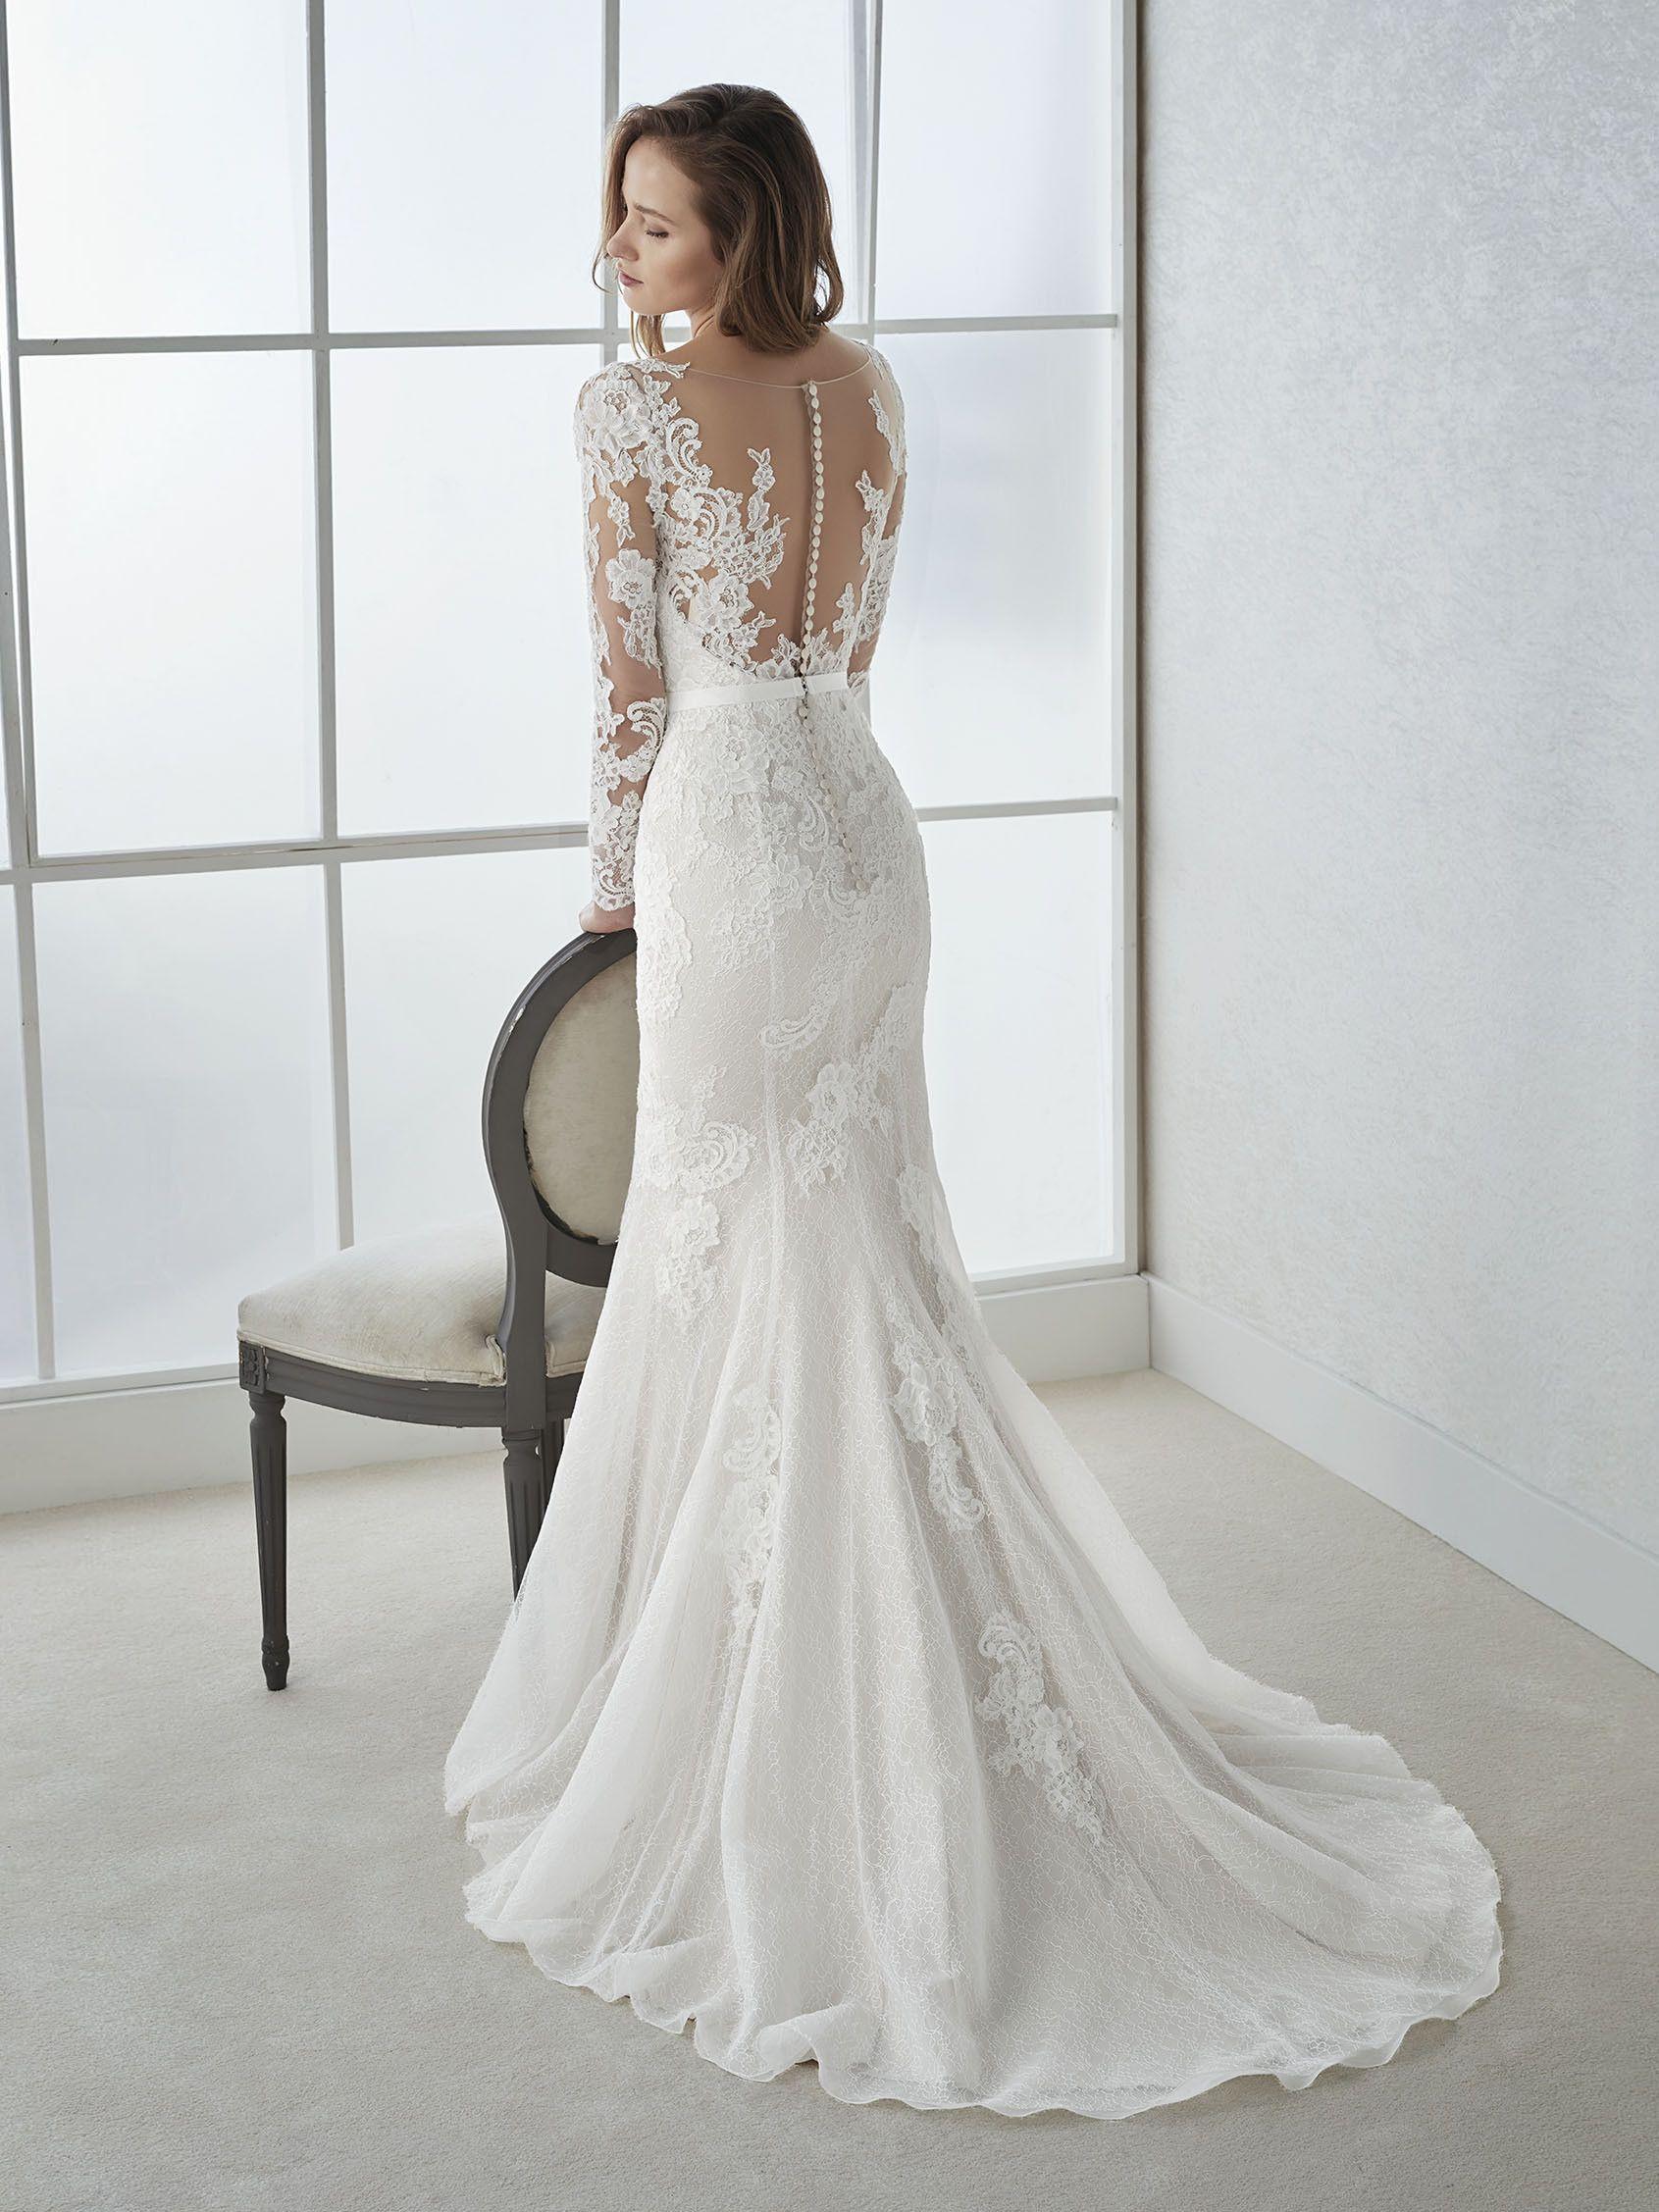 Pin by melissa sicco on wedding dresses pinterest wedding dress